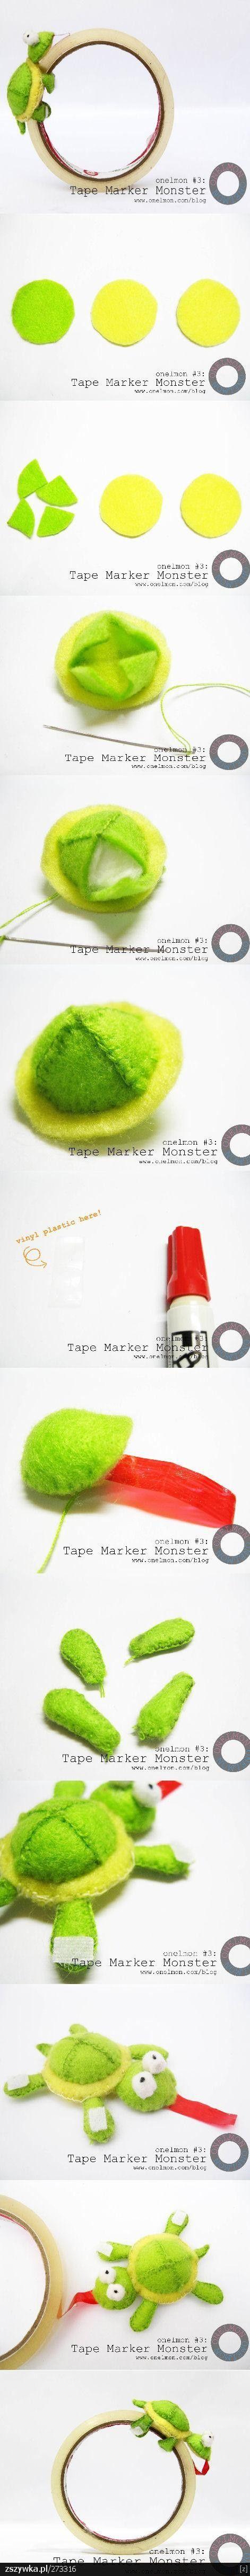 Cute idea! felt tape marker monster